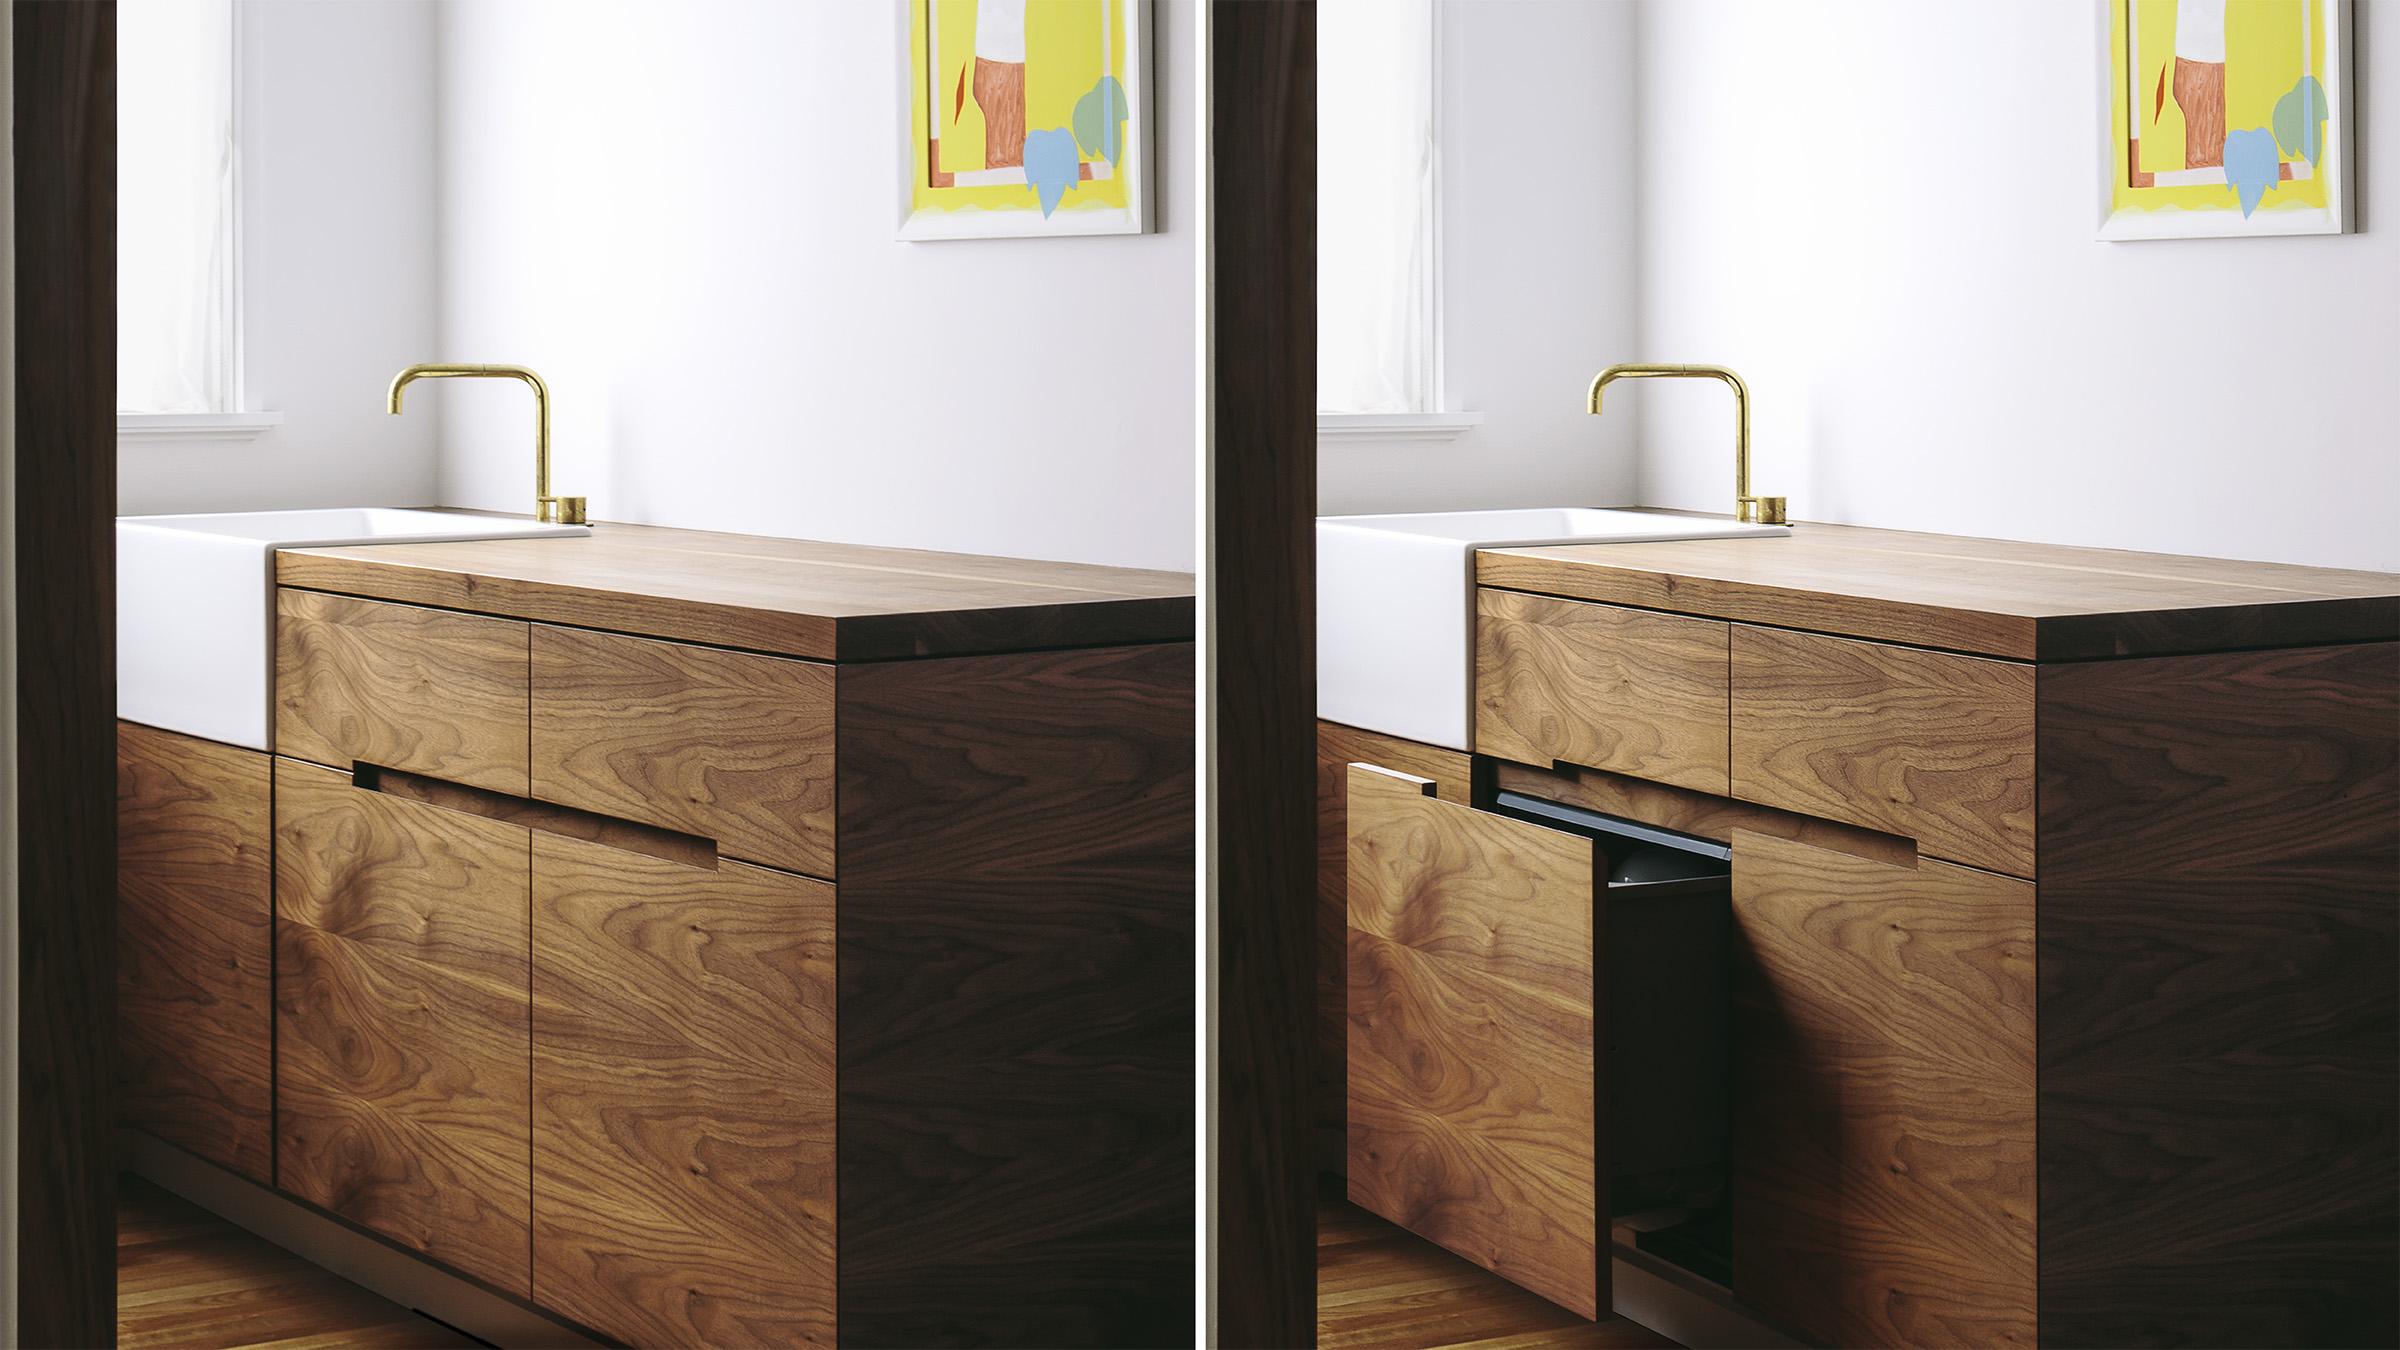 Model: DD24SHTI9_N   Fisher and Paykel DishDrawer™ Dishwasher, 7 Place Settings, Panel Ready (Tall)